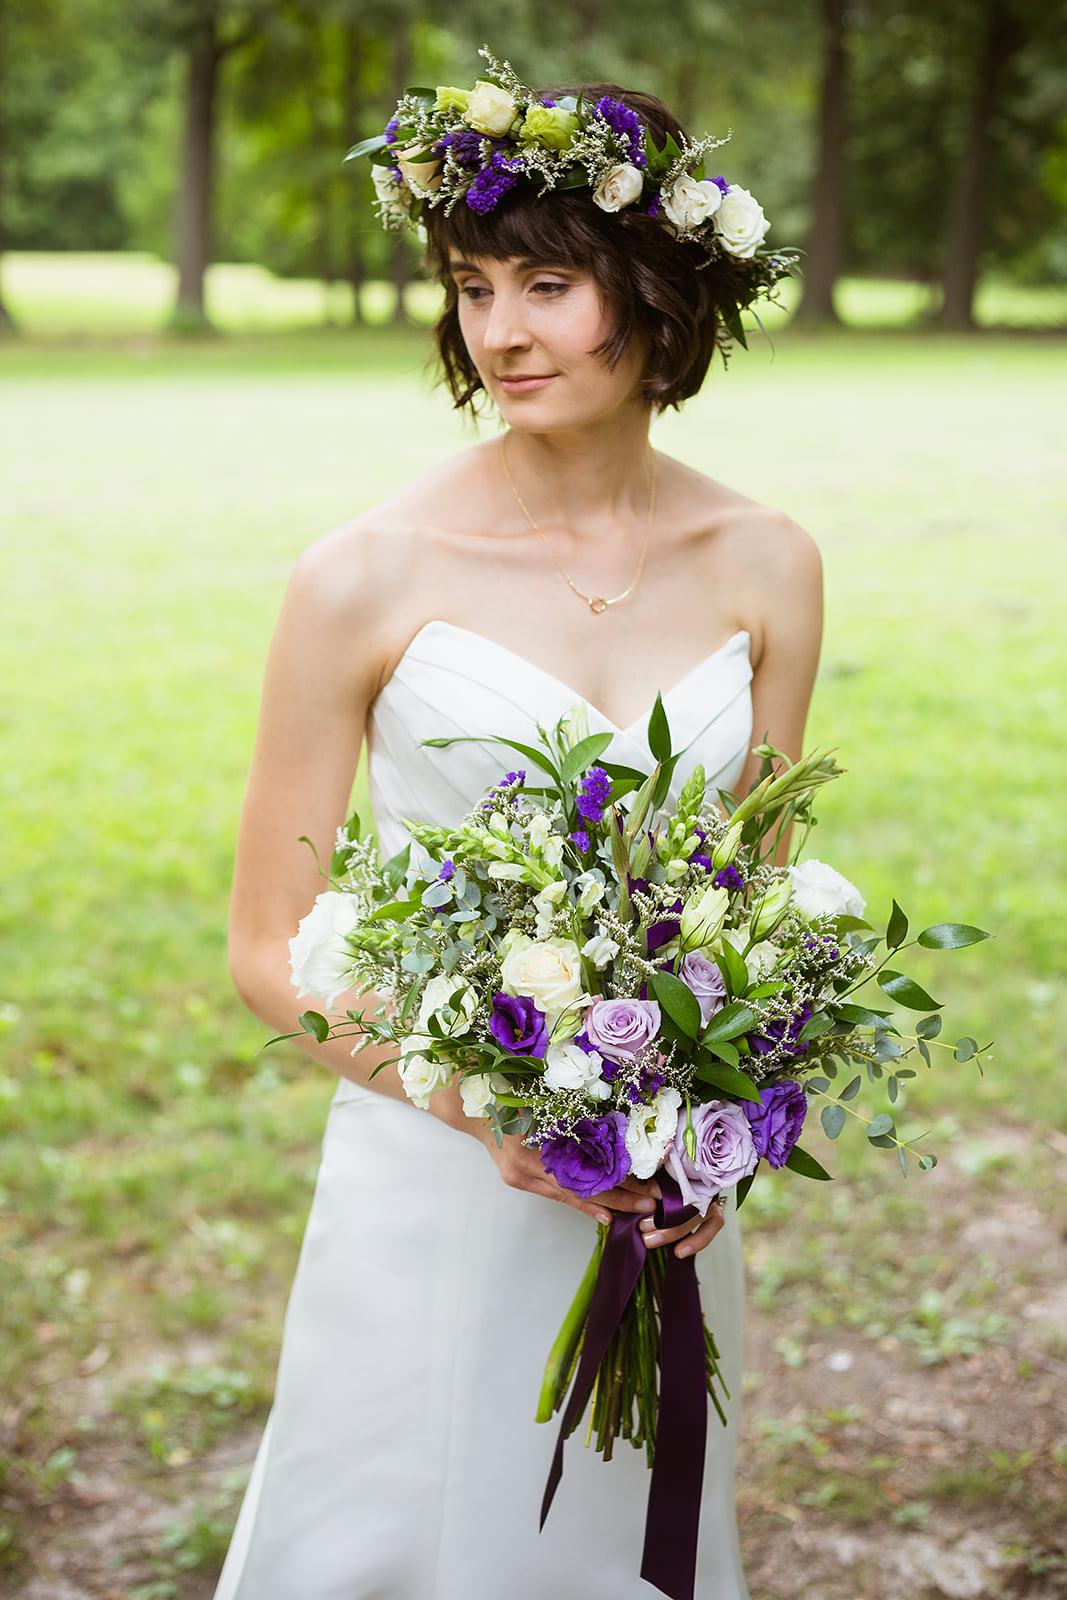 Blacano Wedding - Formals-22.jpg